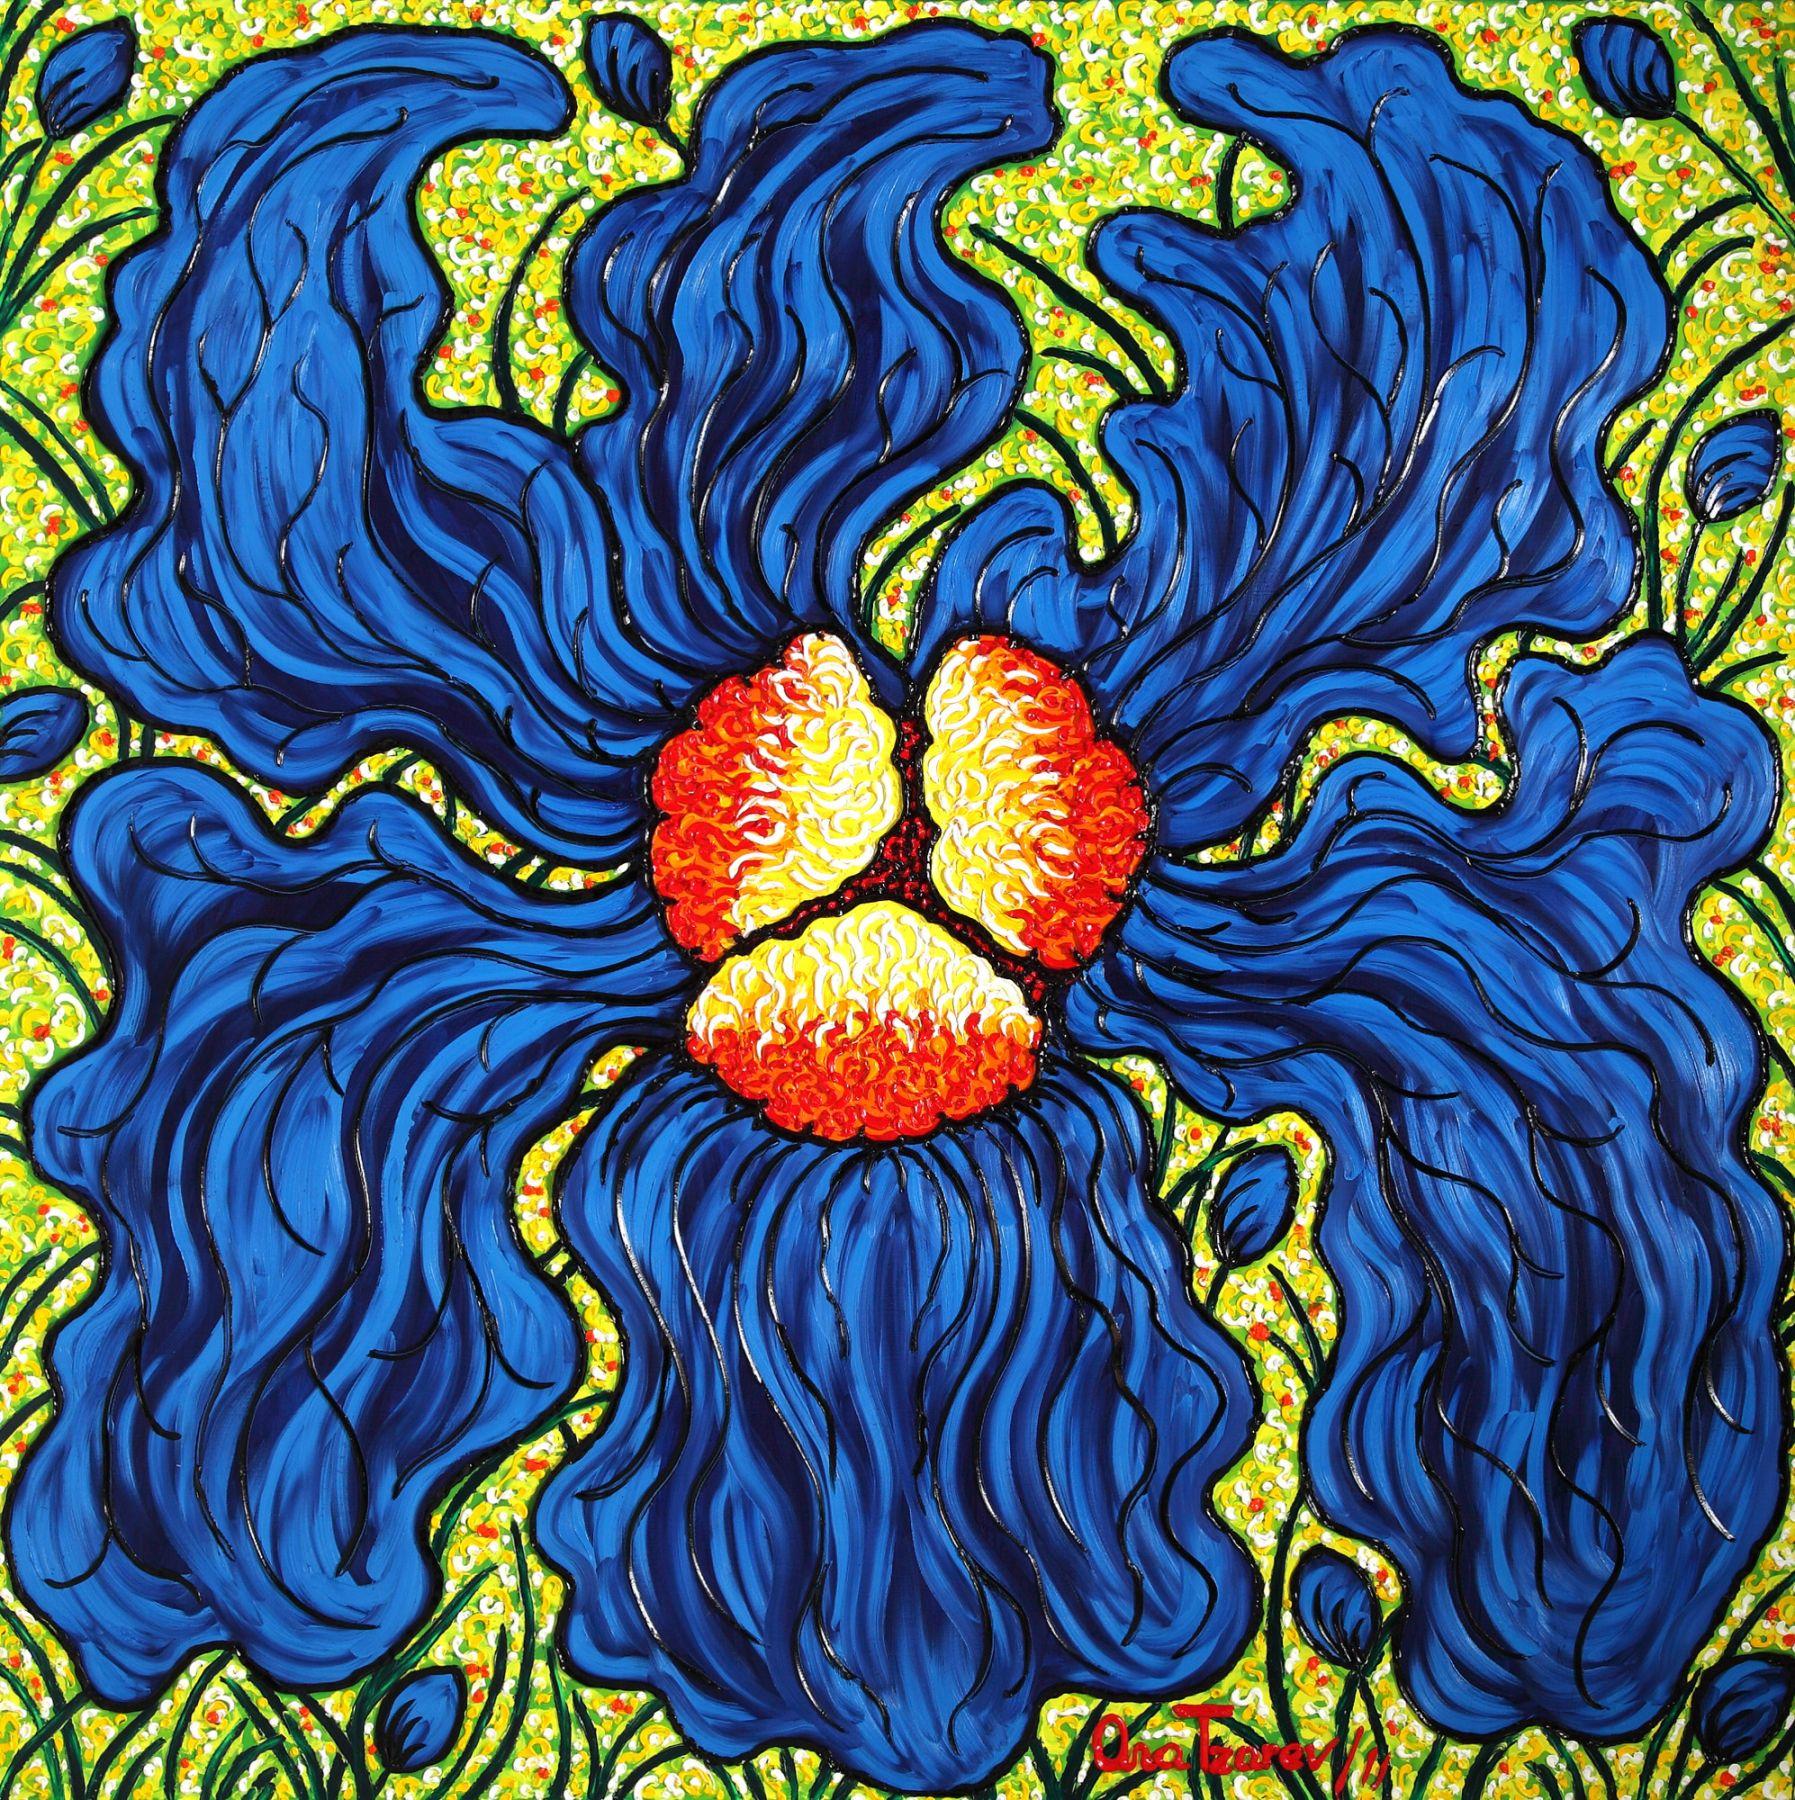 Fascination (Iris) (Garden-La Fleur du Cap), 2011 n 4175